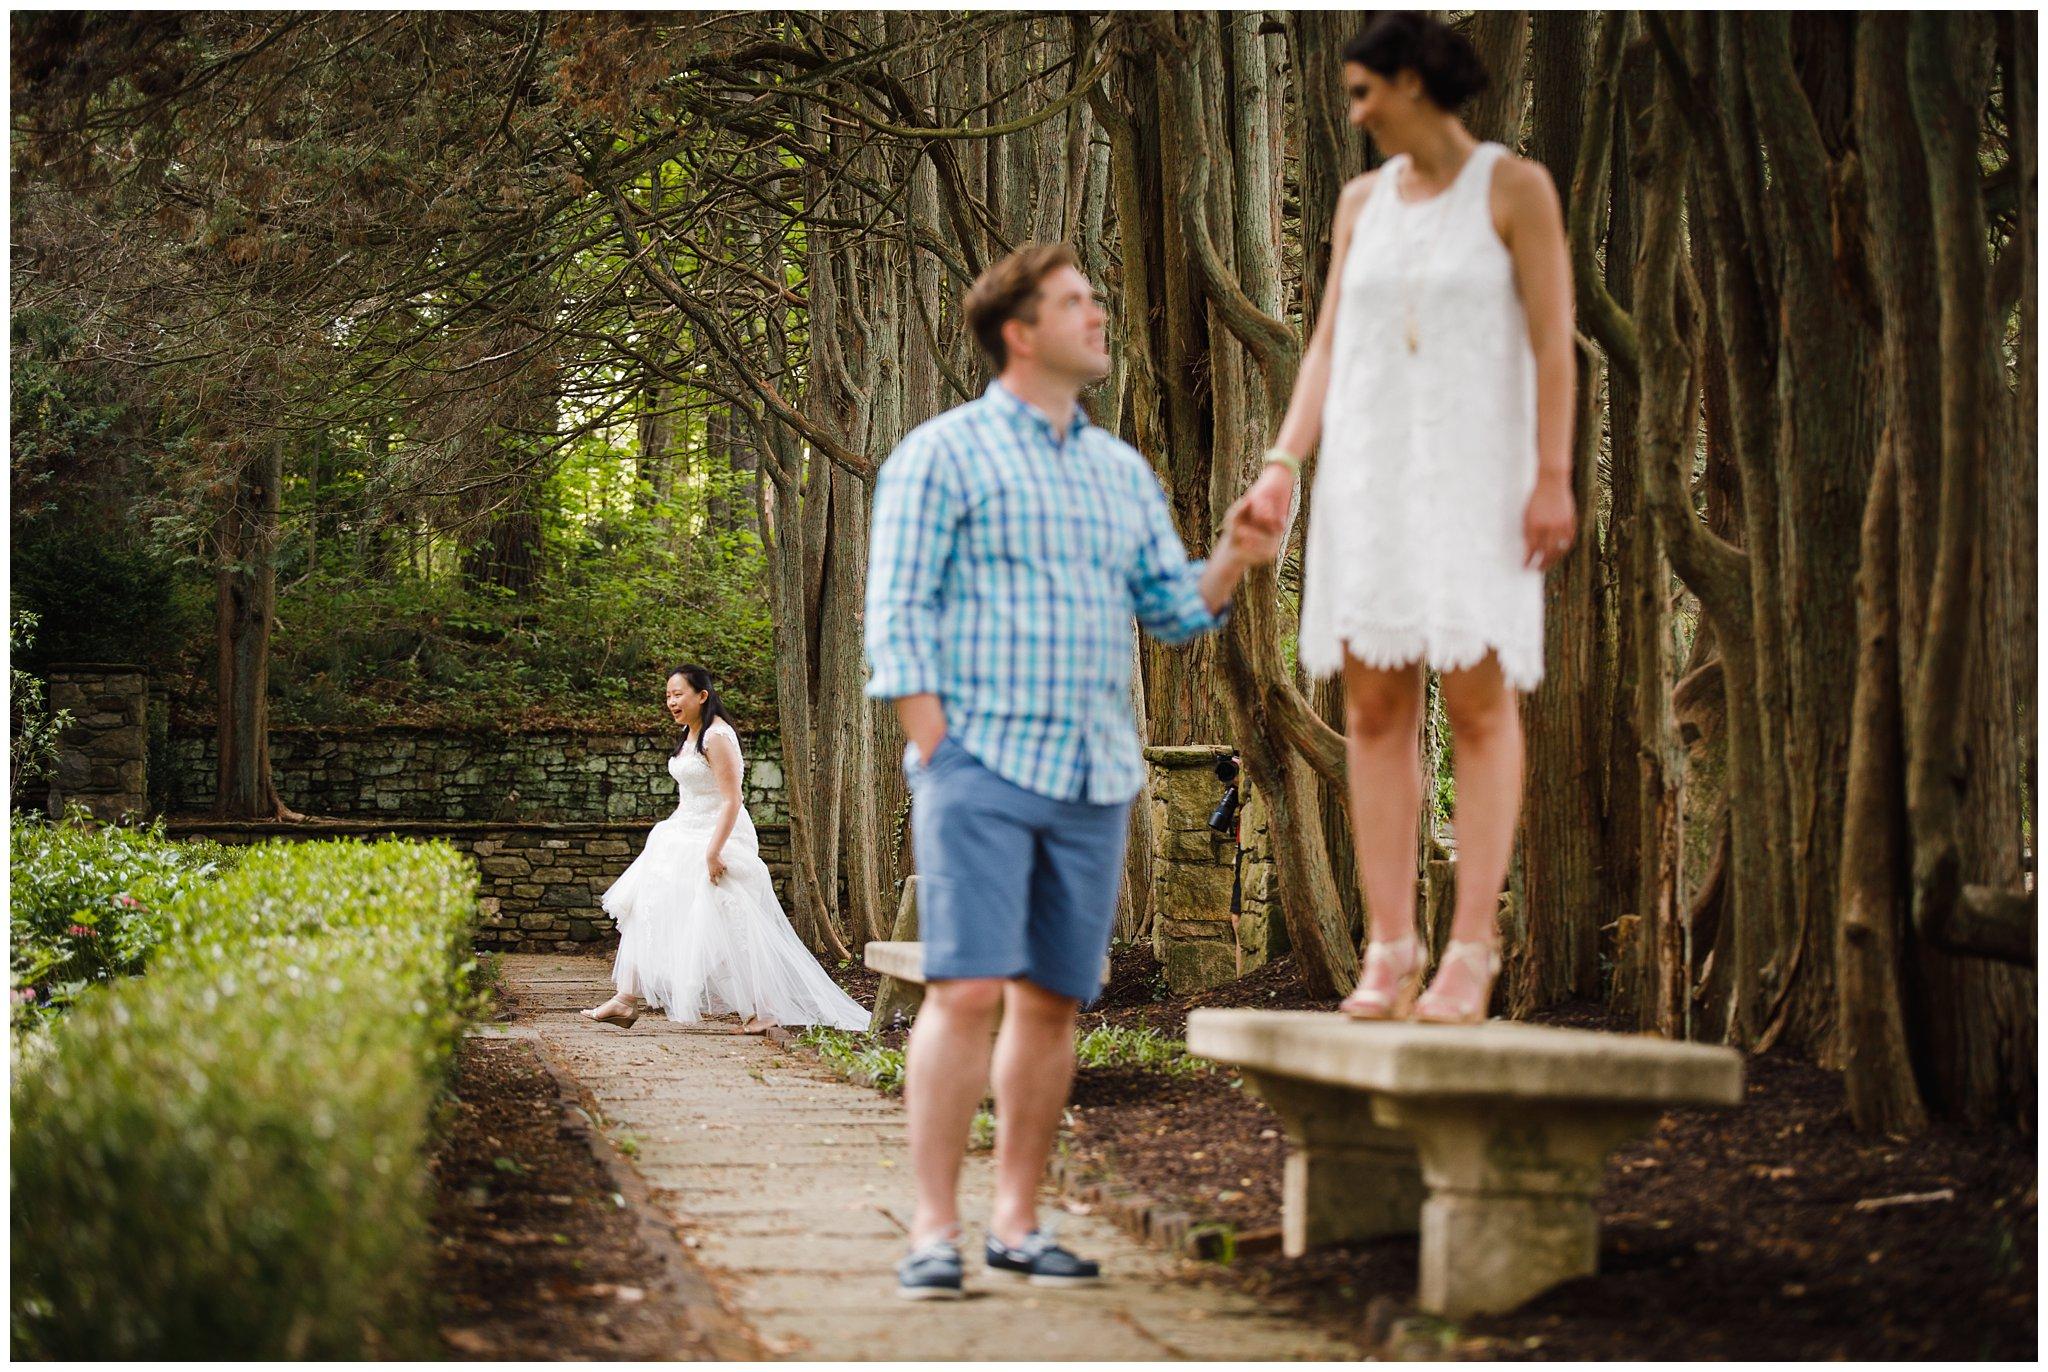 Engagement Photography Delaware County Ridley Creek State Park Wedding Photographer Philadelphia